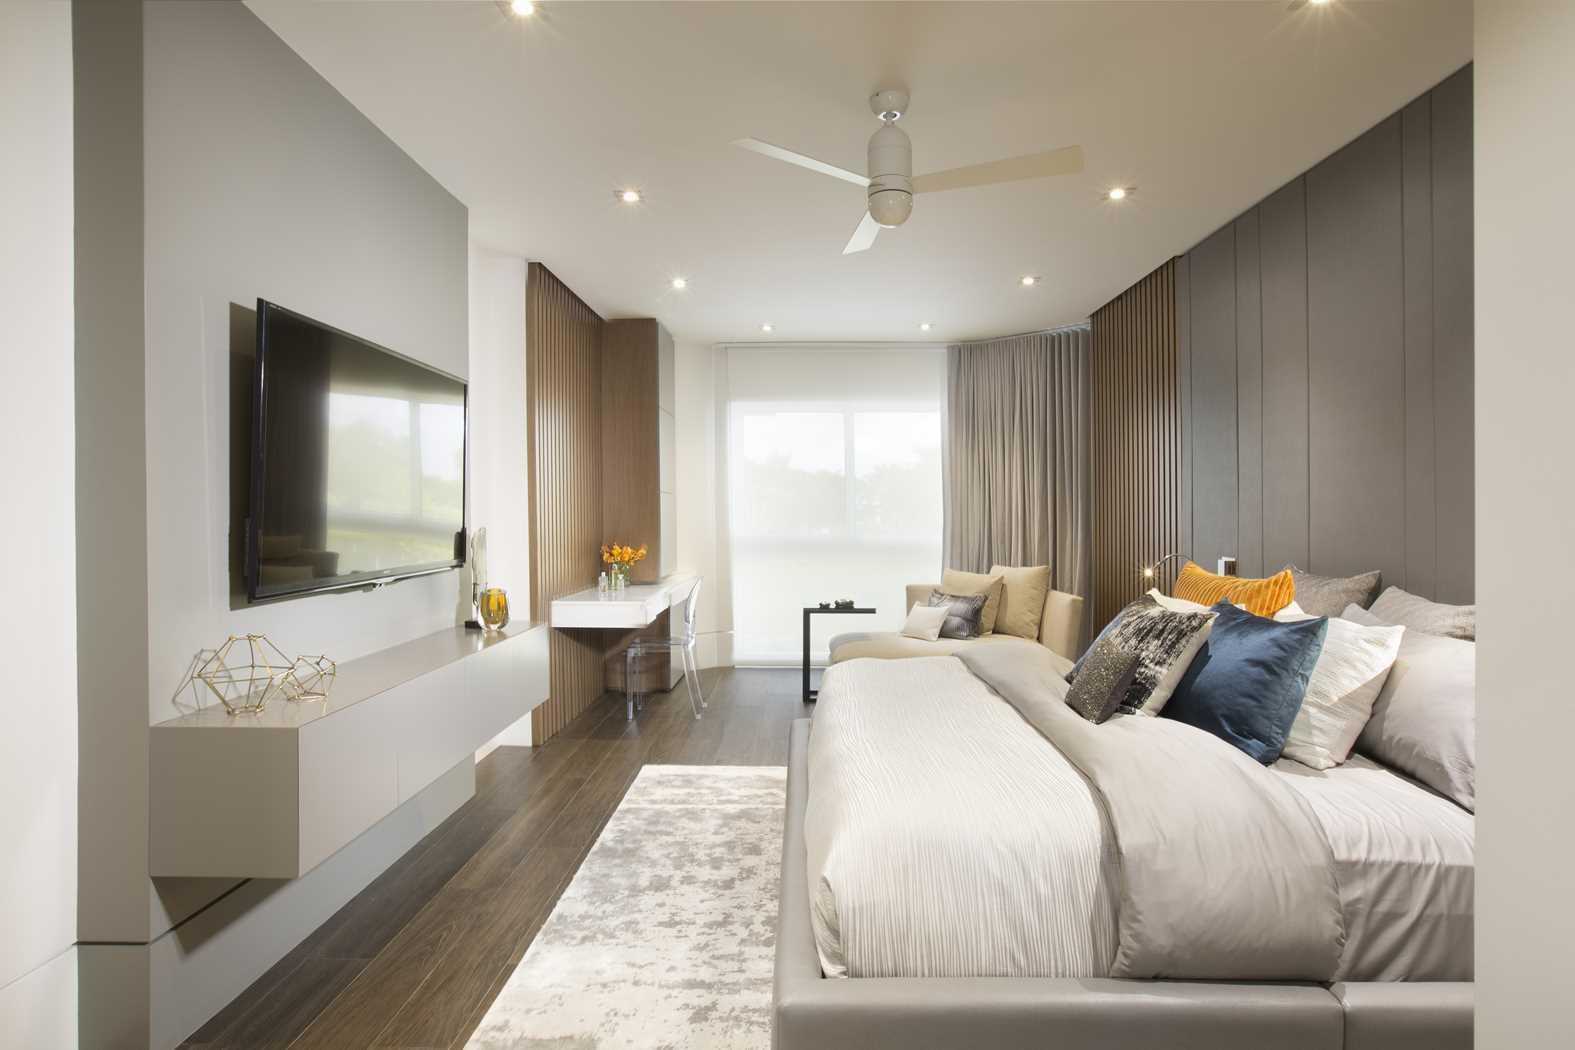 25 Master Bedroom Design Ideas - Home Dreamy on Master Bedroom Ideas  id=24950